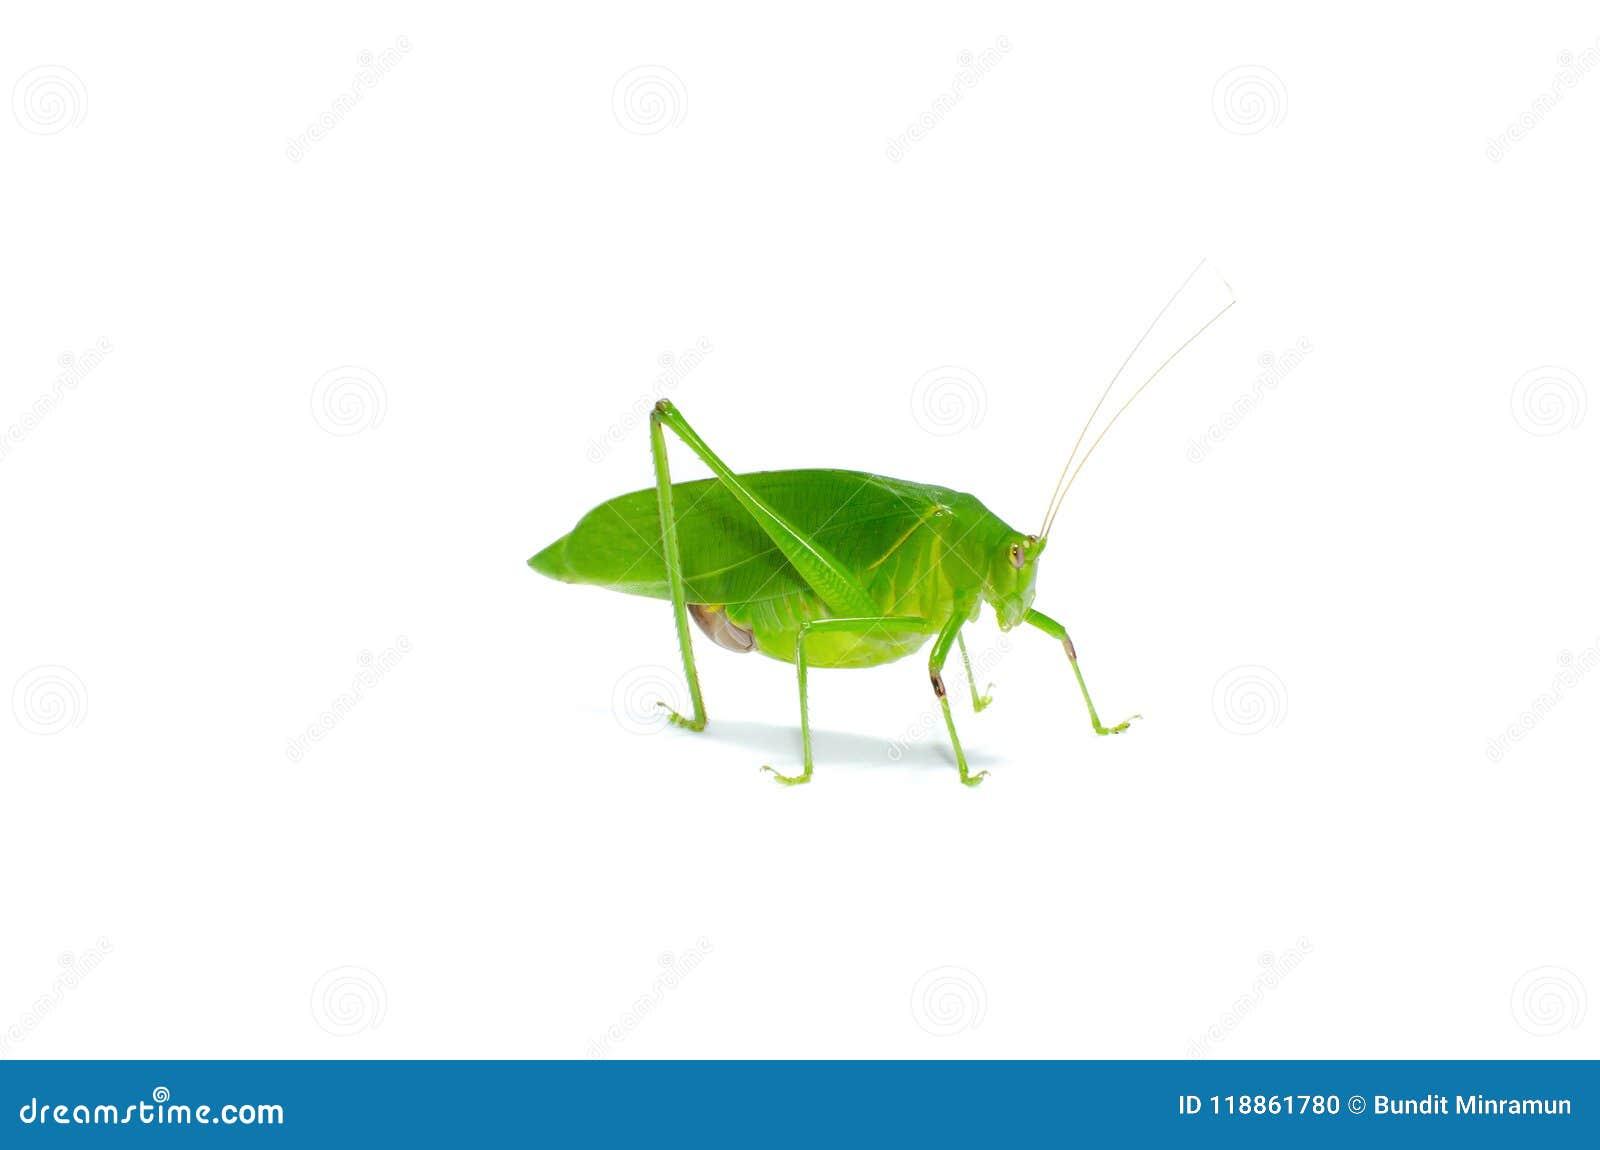 Lang-Gehoornde die Sprinkhaan van de Katydid de Groene Sprinkhaan op witte achtergrond wordt geïsoleerd